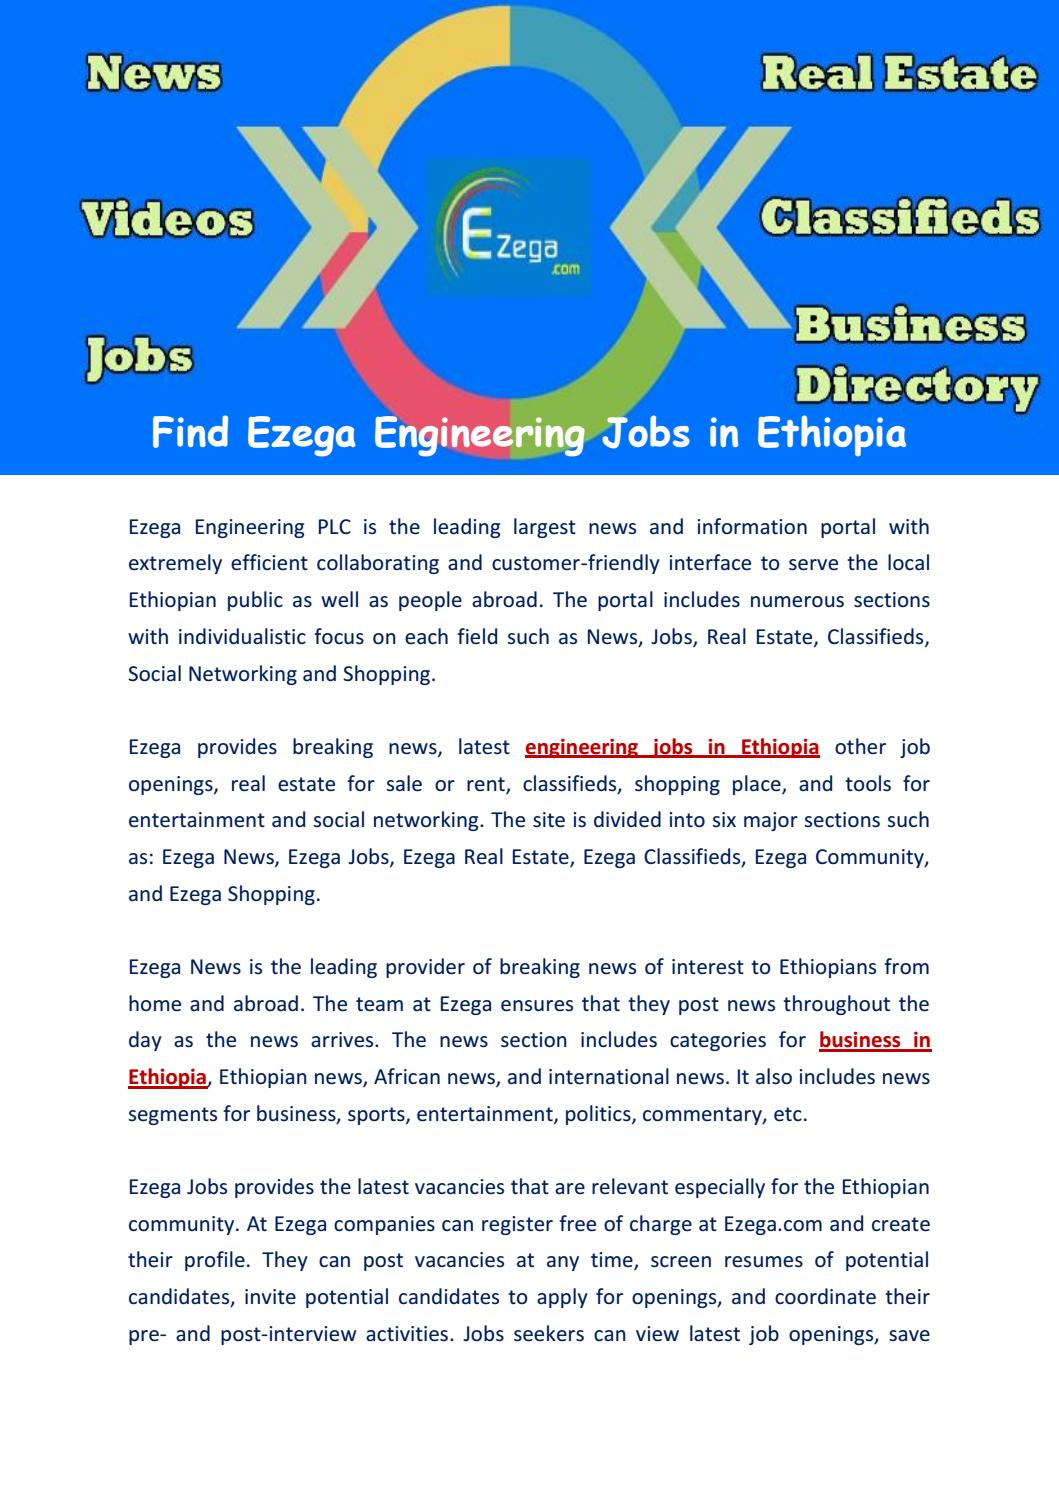 Find Ezega Engineering Jobs in Ethiopia by ezega - issuu